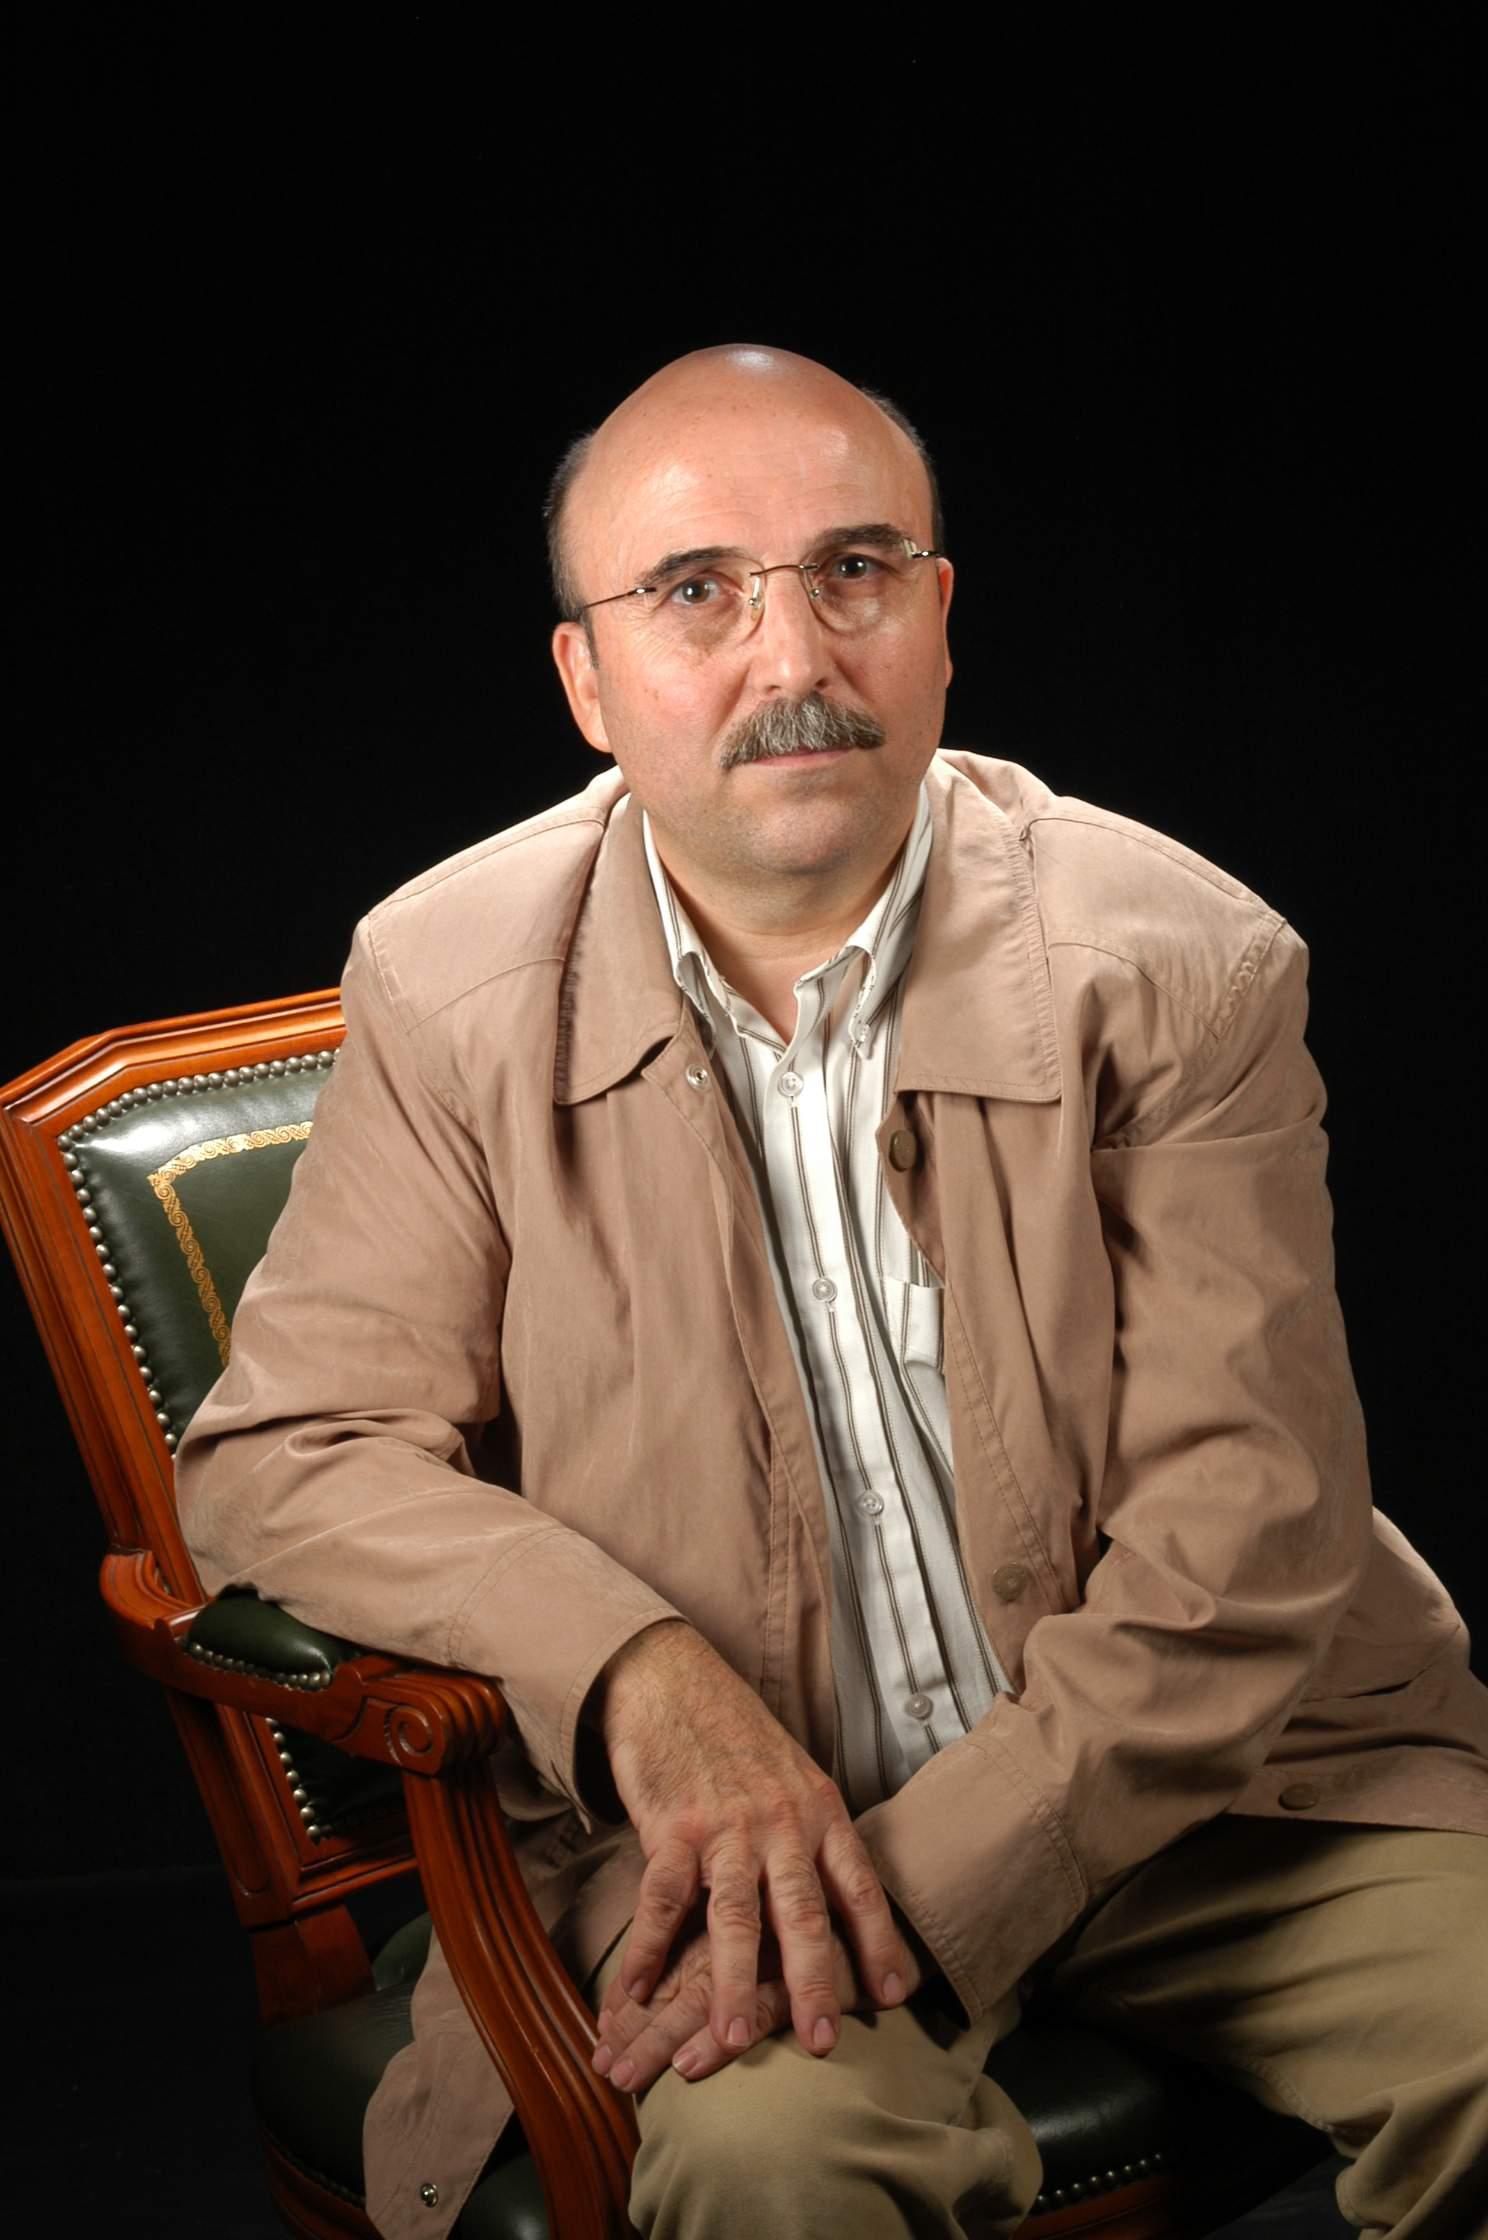 Sr. Primitivo Alcalde Cristobal